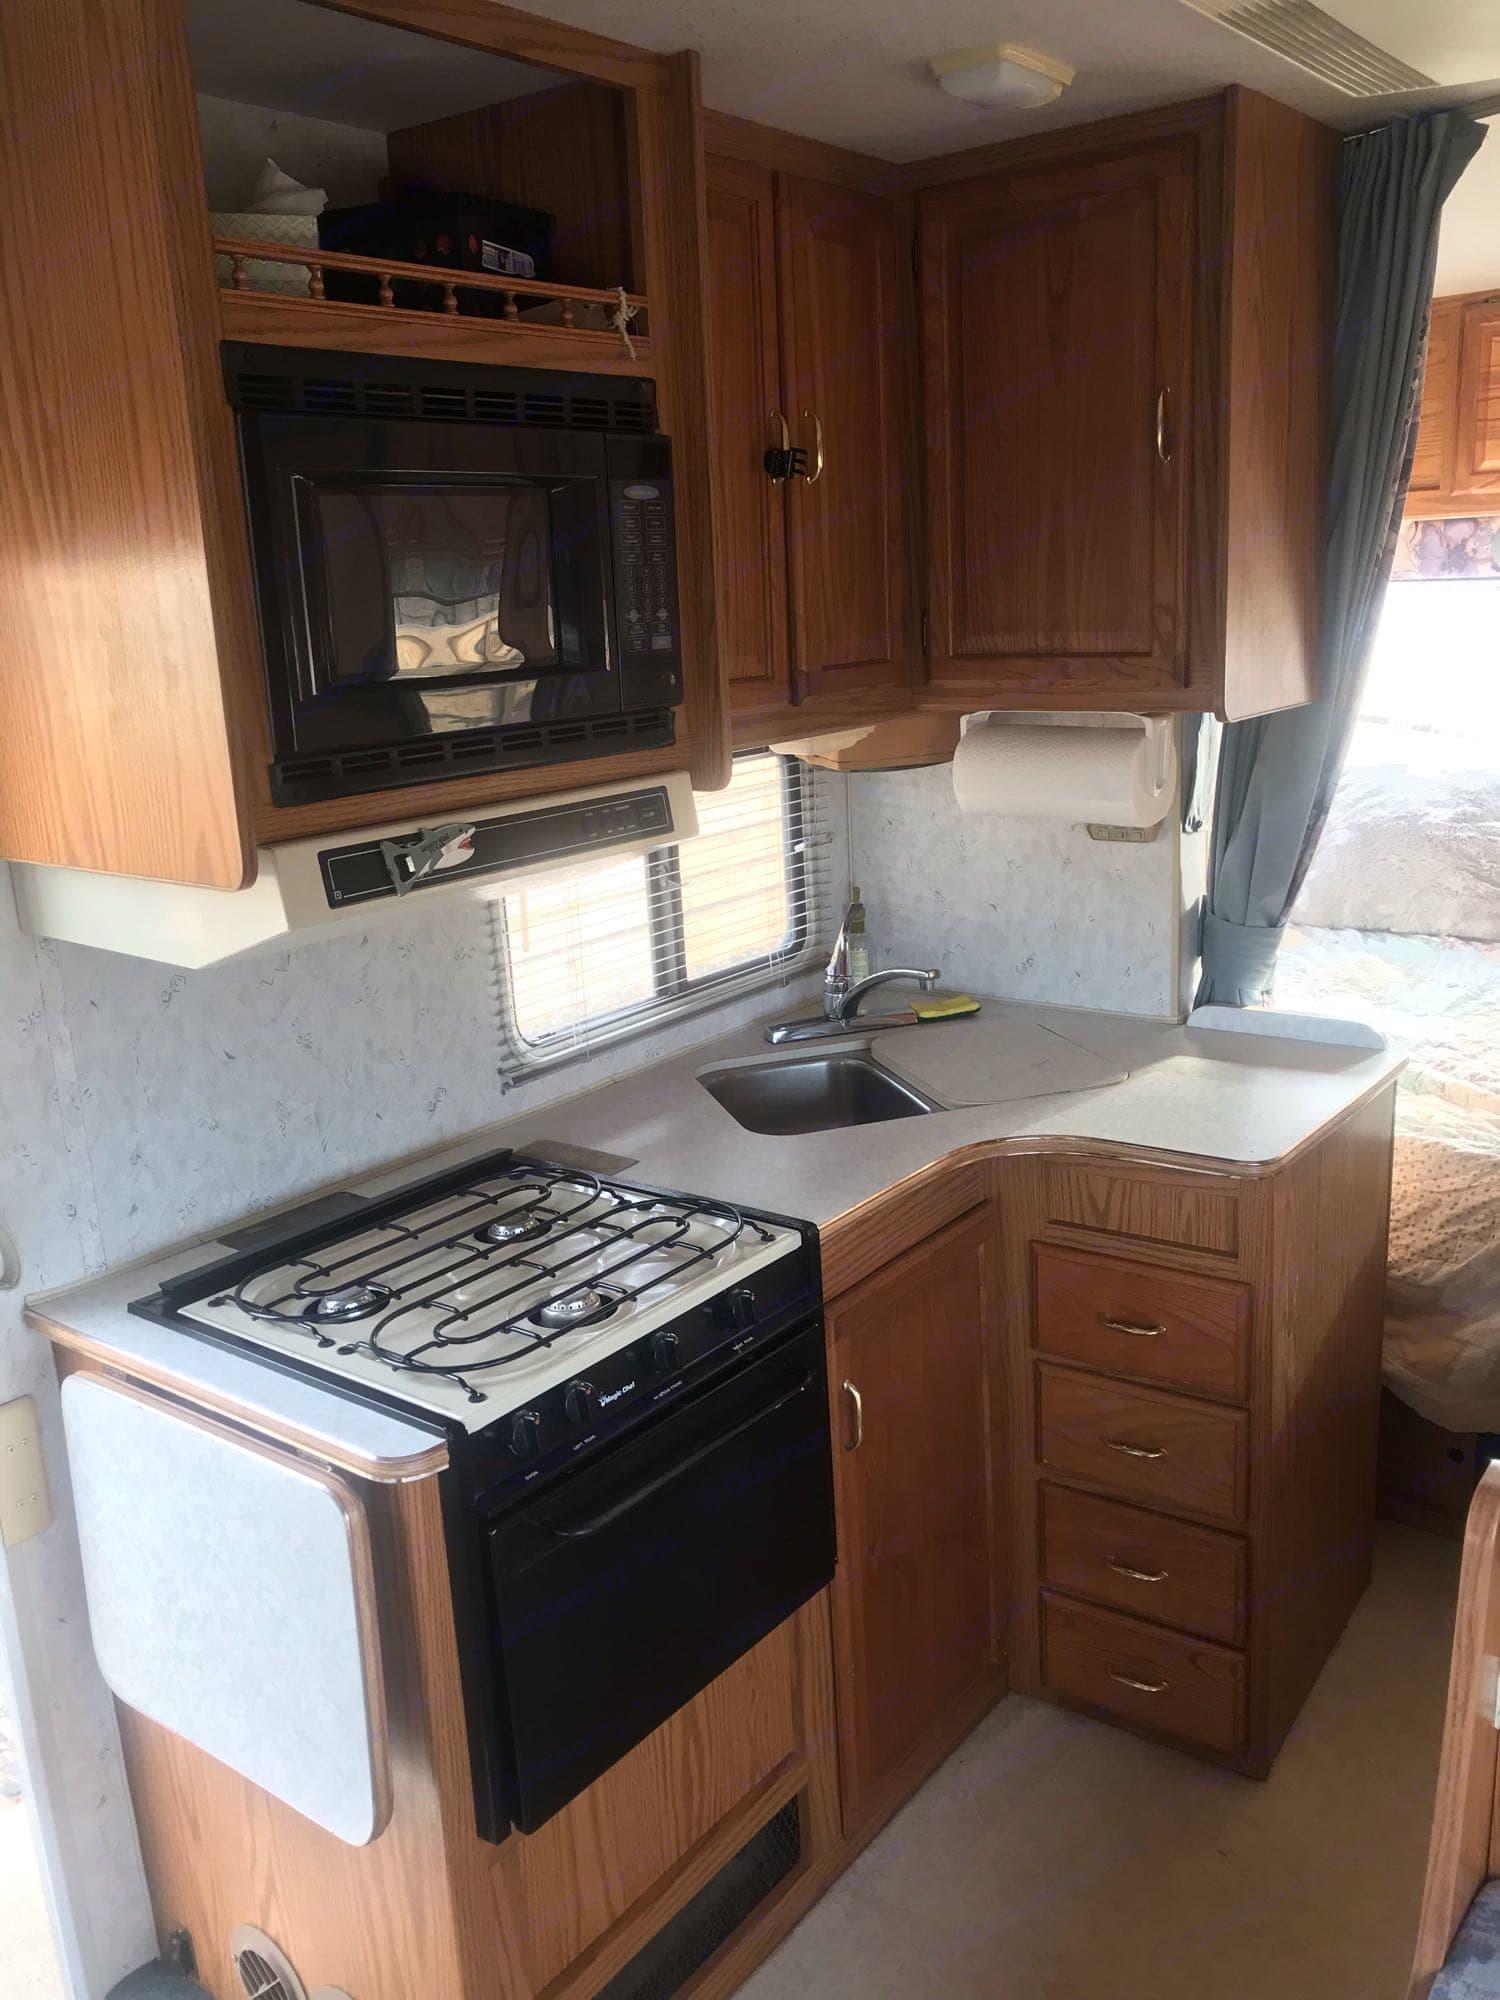 Kitchen with microwave, stove top, sink, fridge, and freezer.. Winnebago Minnie Winnie 1999